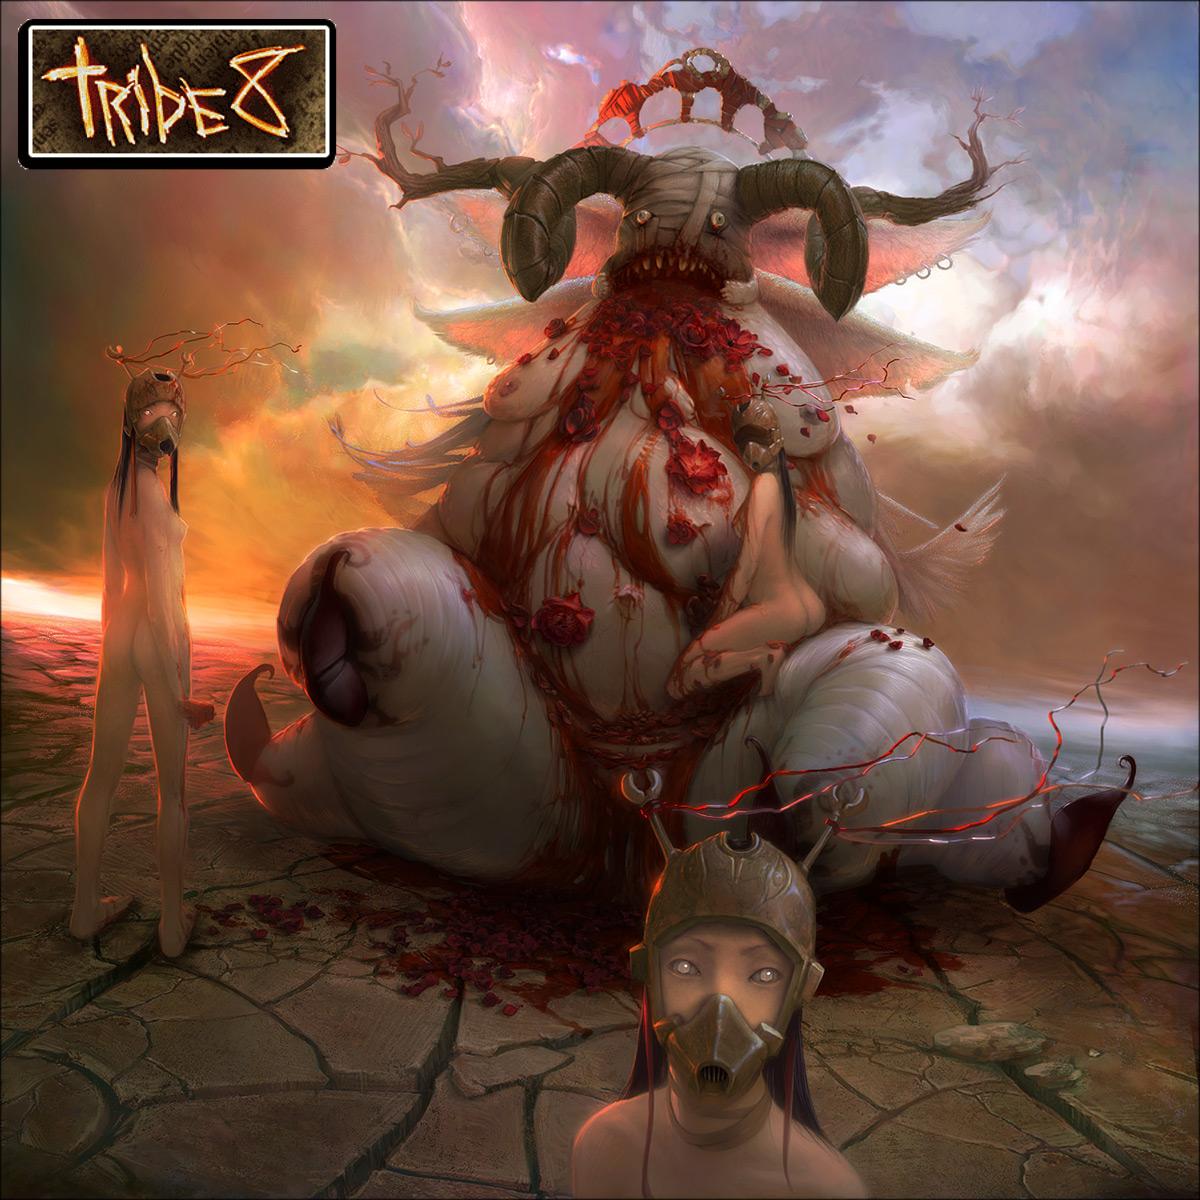 http://3.bp.blogspot.com/_z_nVOuaUIFs/TI-NF4GISZI/AAAAAAAADDw/LqwvaxZM4ZU/s1600/tribe8_fakecover.jpg